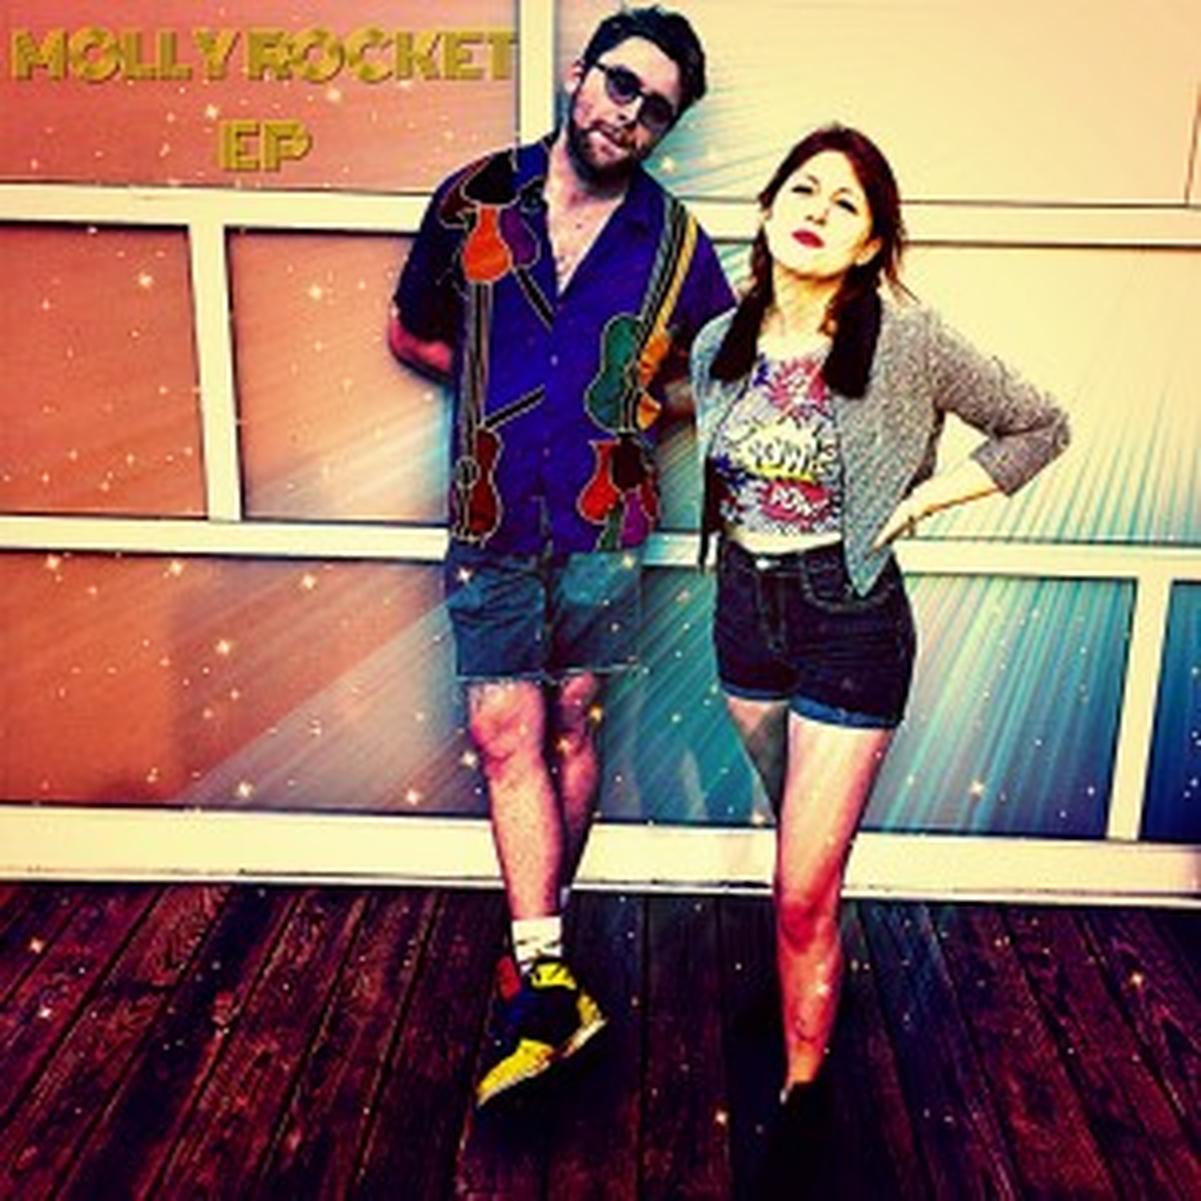 Molly Rocket wiki, Molly Rocket review, Molly Rocket history, Molly Rocket news